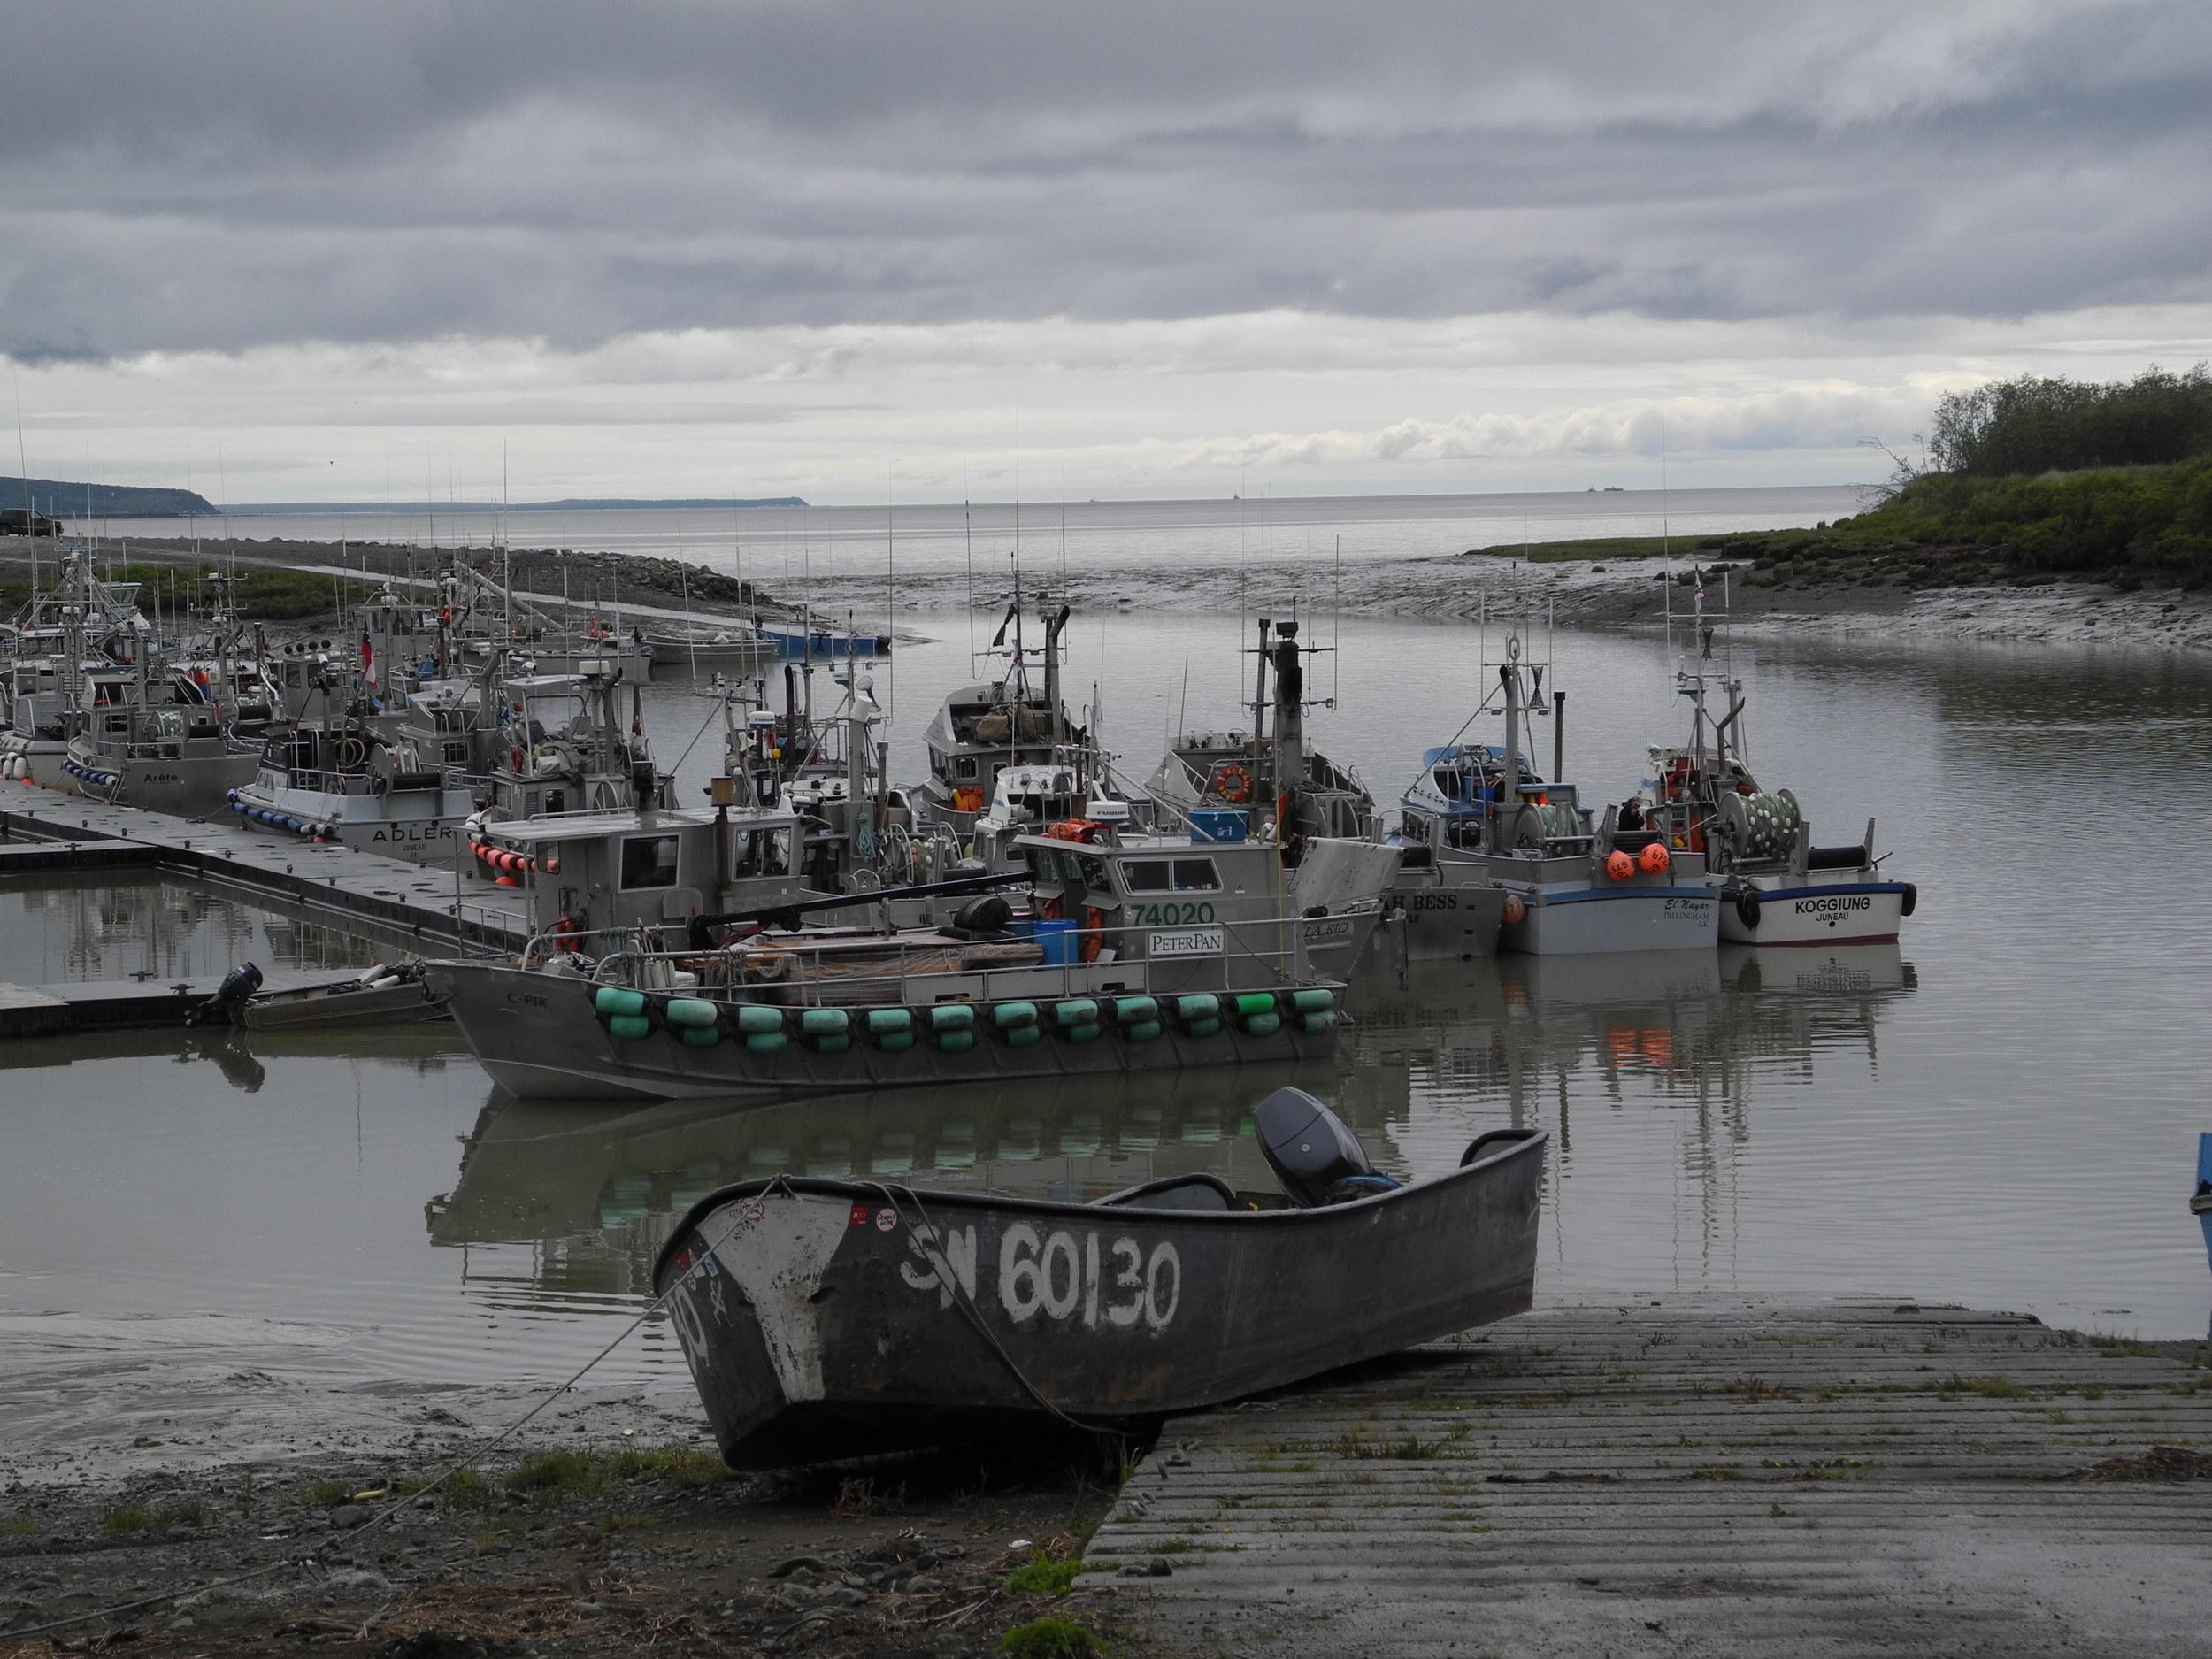 Popular commercial boat launch in Dillingham, Alaska